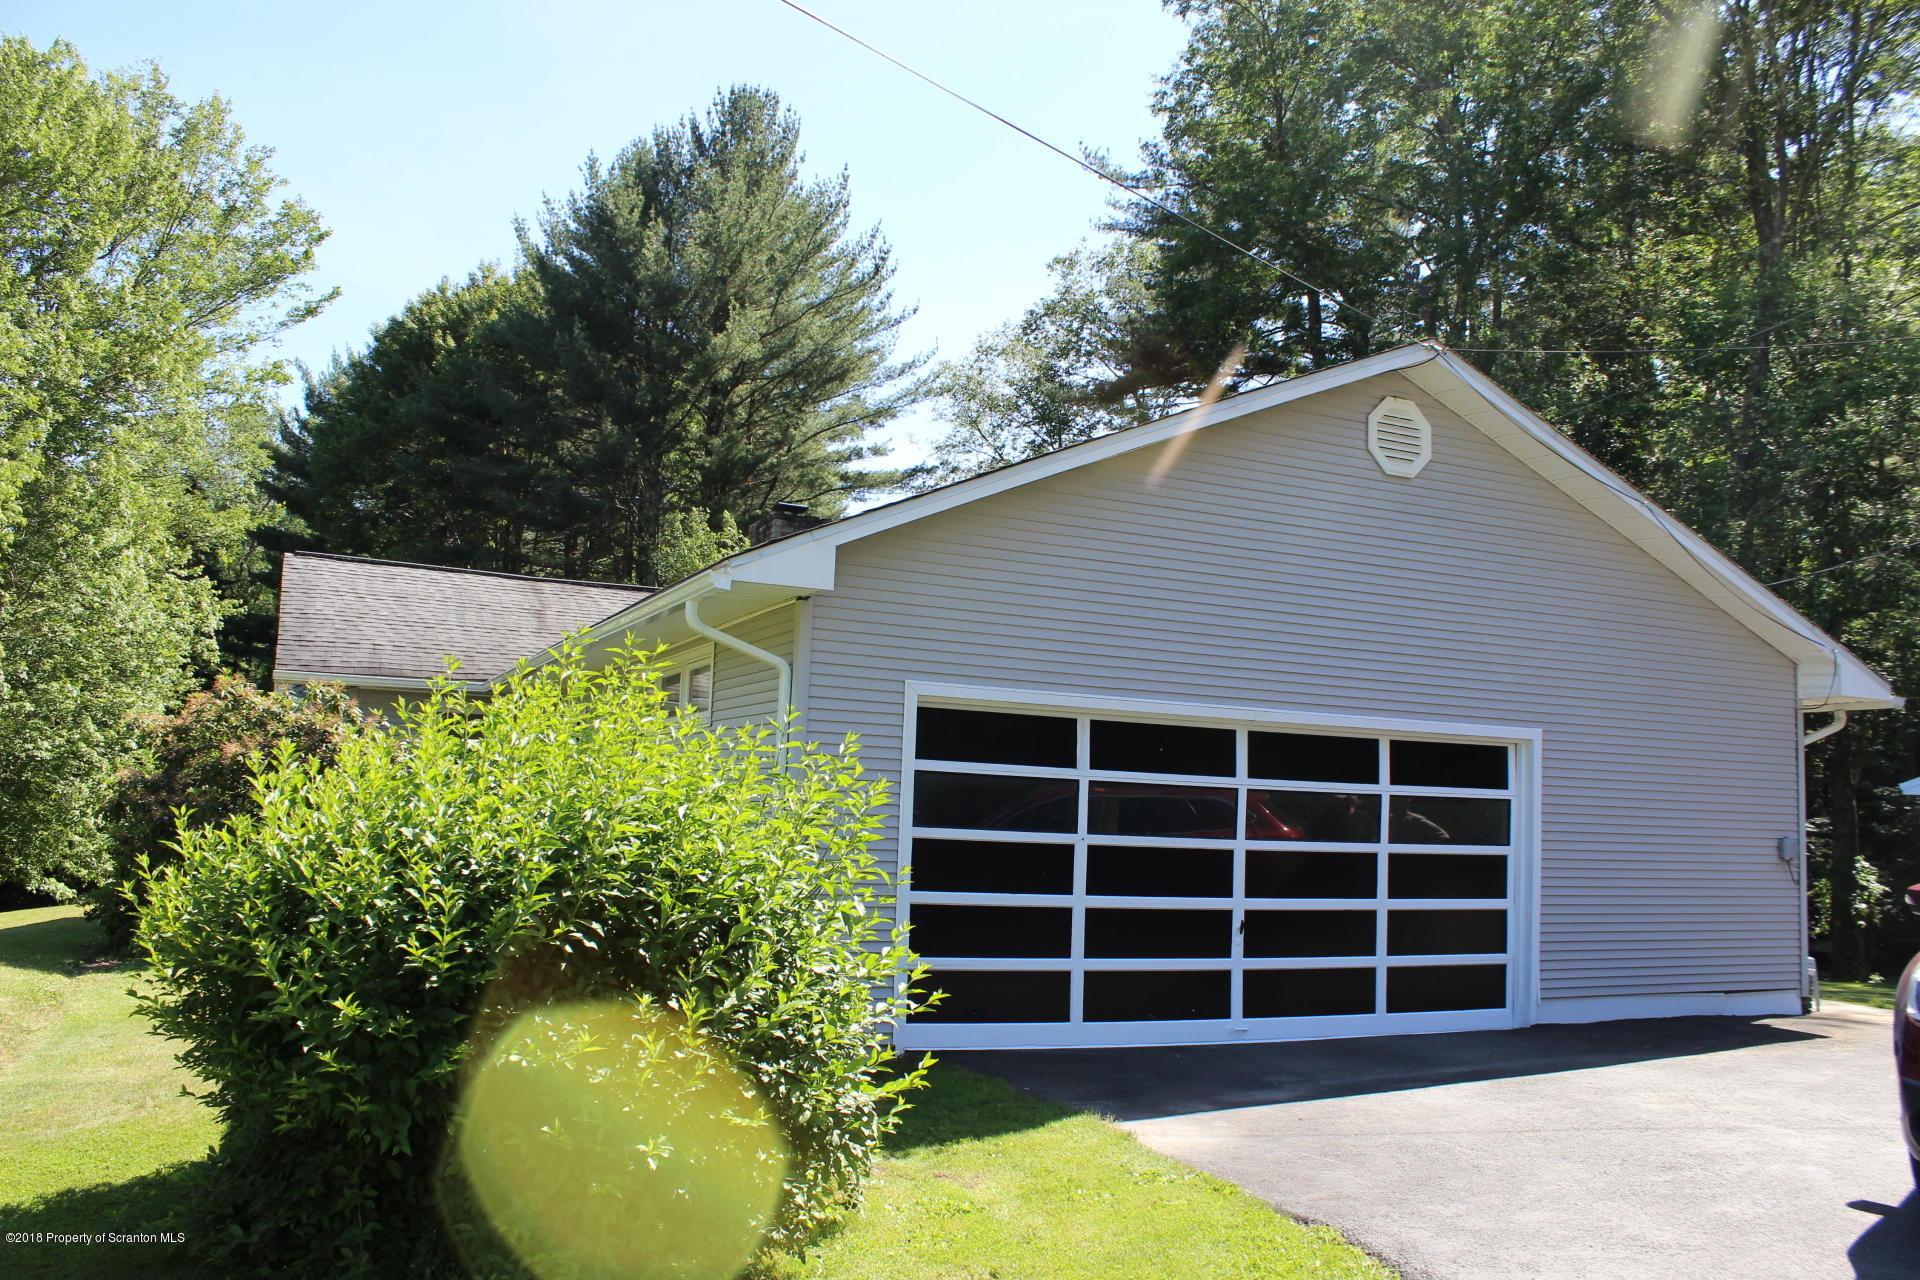 271 SR 2016, Nicholson, Pennsylvania 18446, ,1 BathroomBathrooms,Commercial,For Sale,SR 2016,18-2832